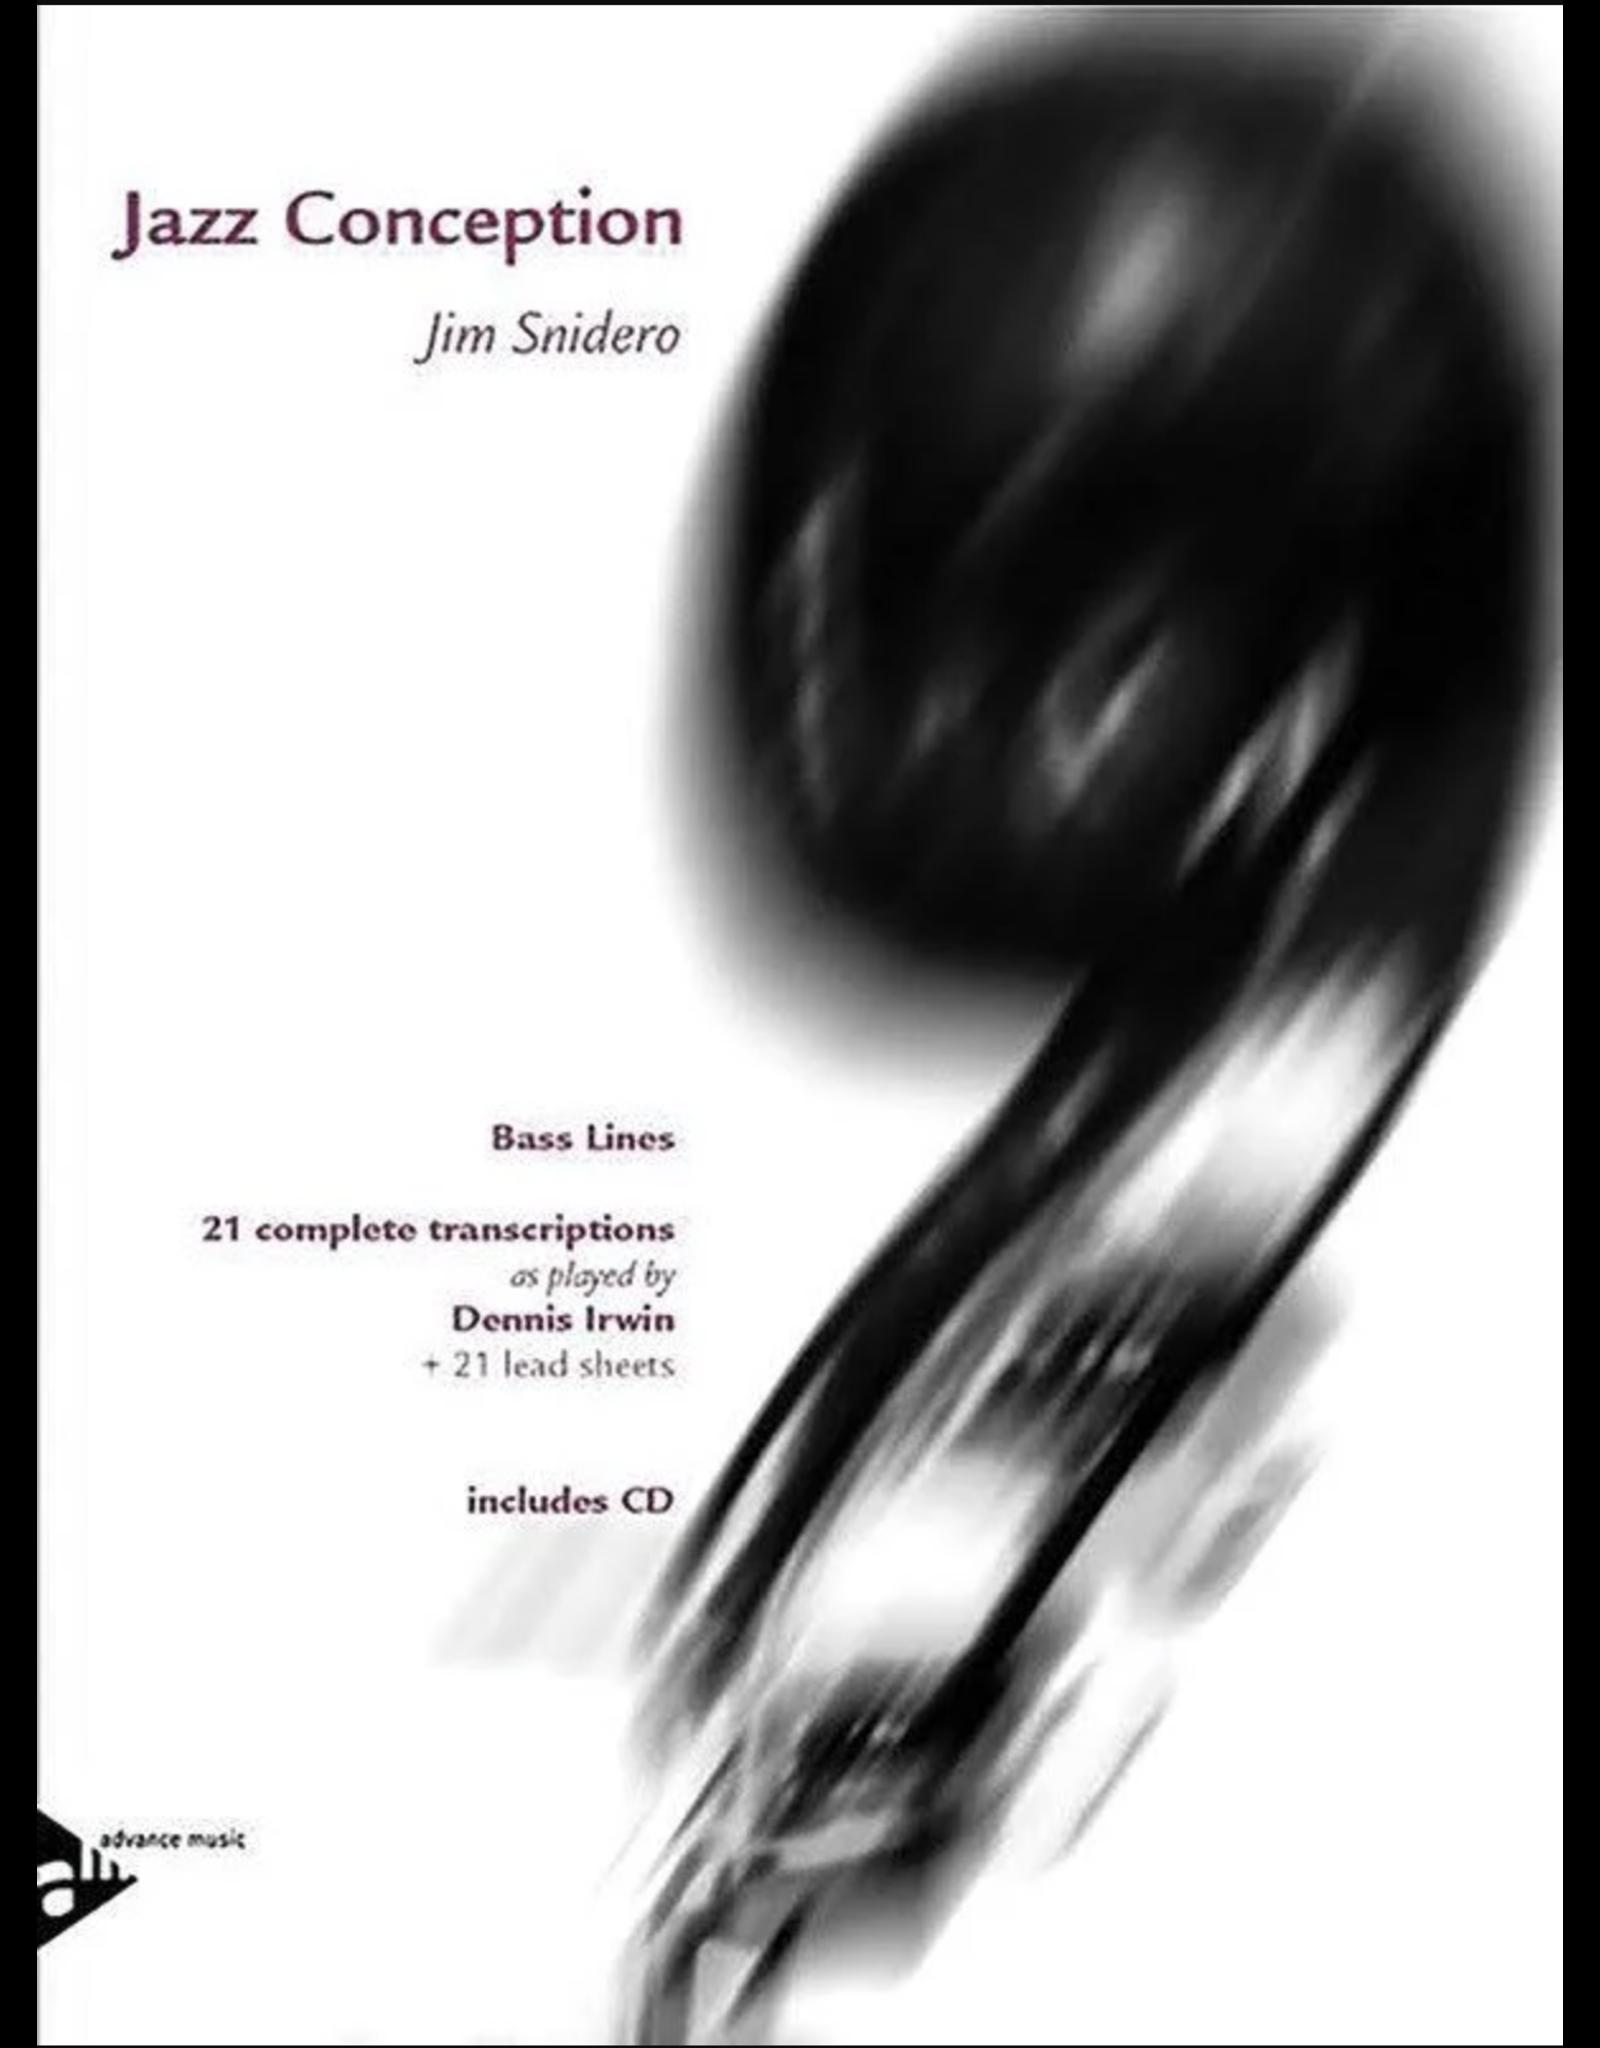 Generic Snidero Jazz Conception - Bass Lines